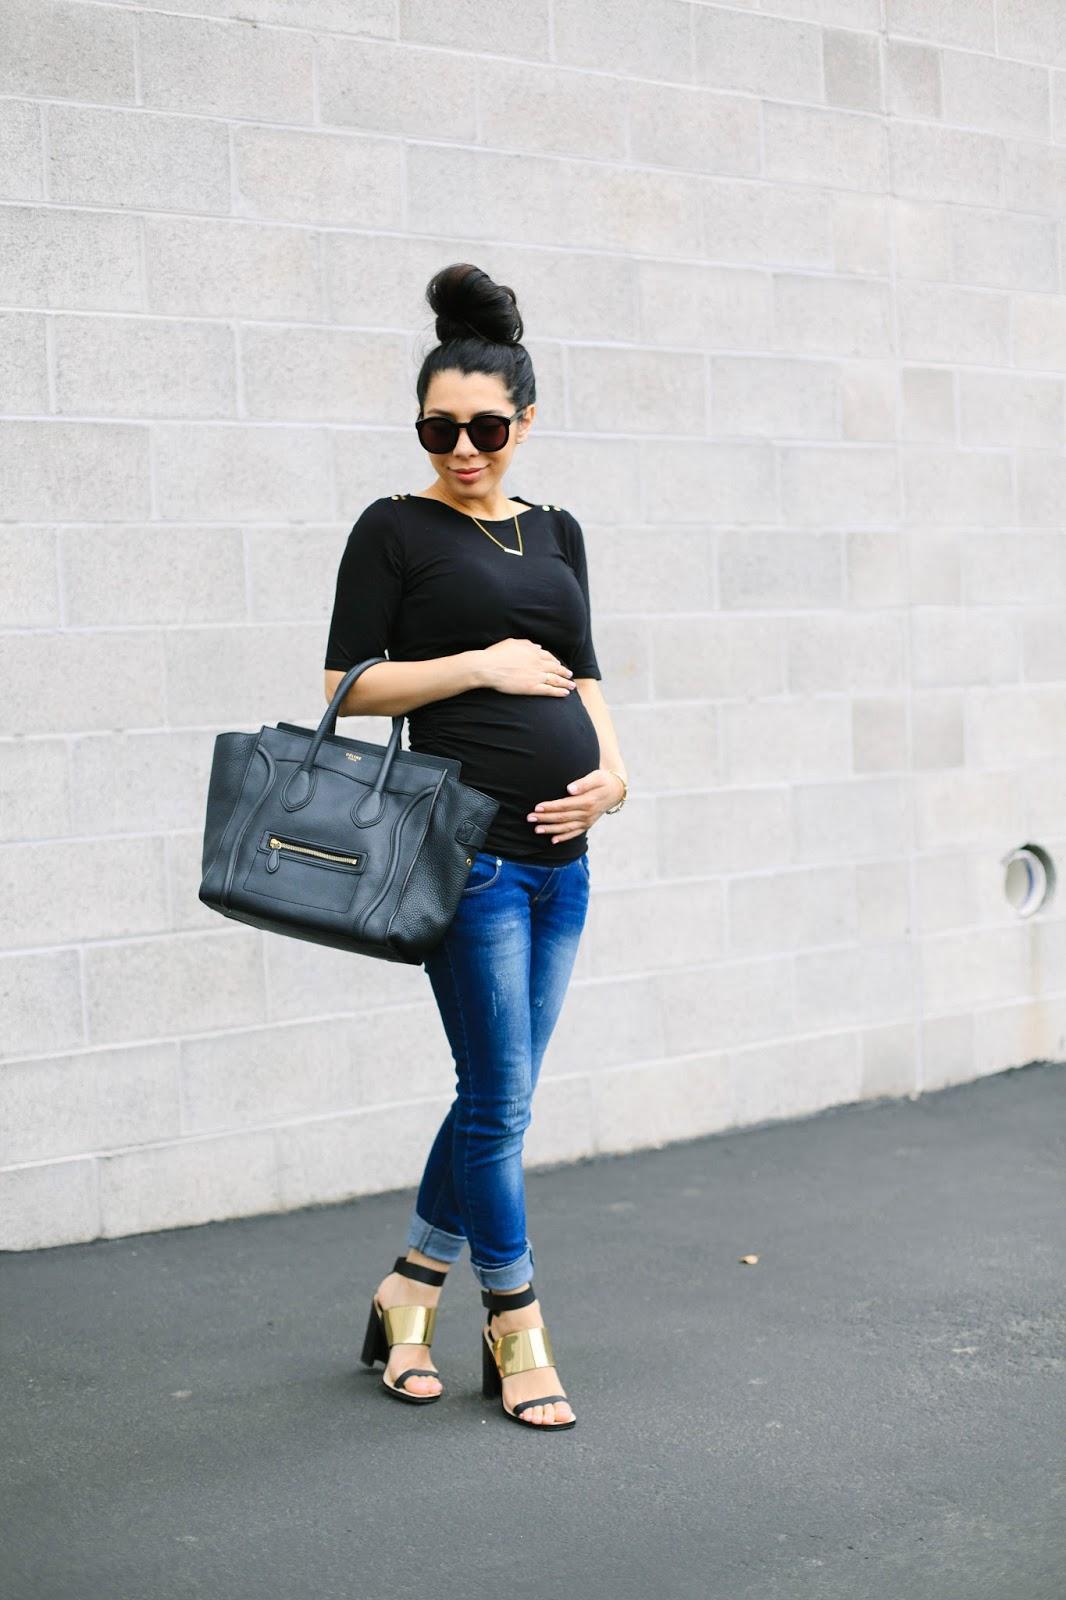 asos maternity, bump style, maternity style, zara heels, karen walker sunglasses, super duper, cartier love bracelet, chelsea charles bracelet, celine mini luggage tote,